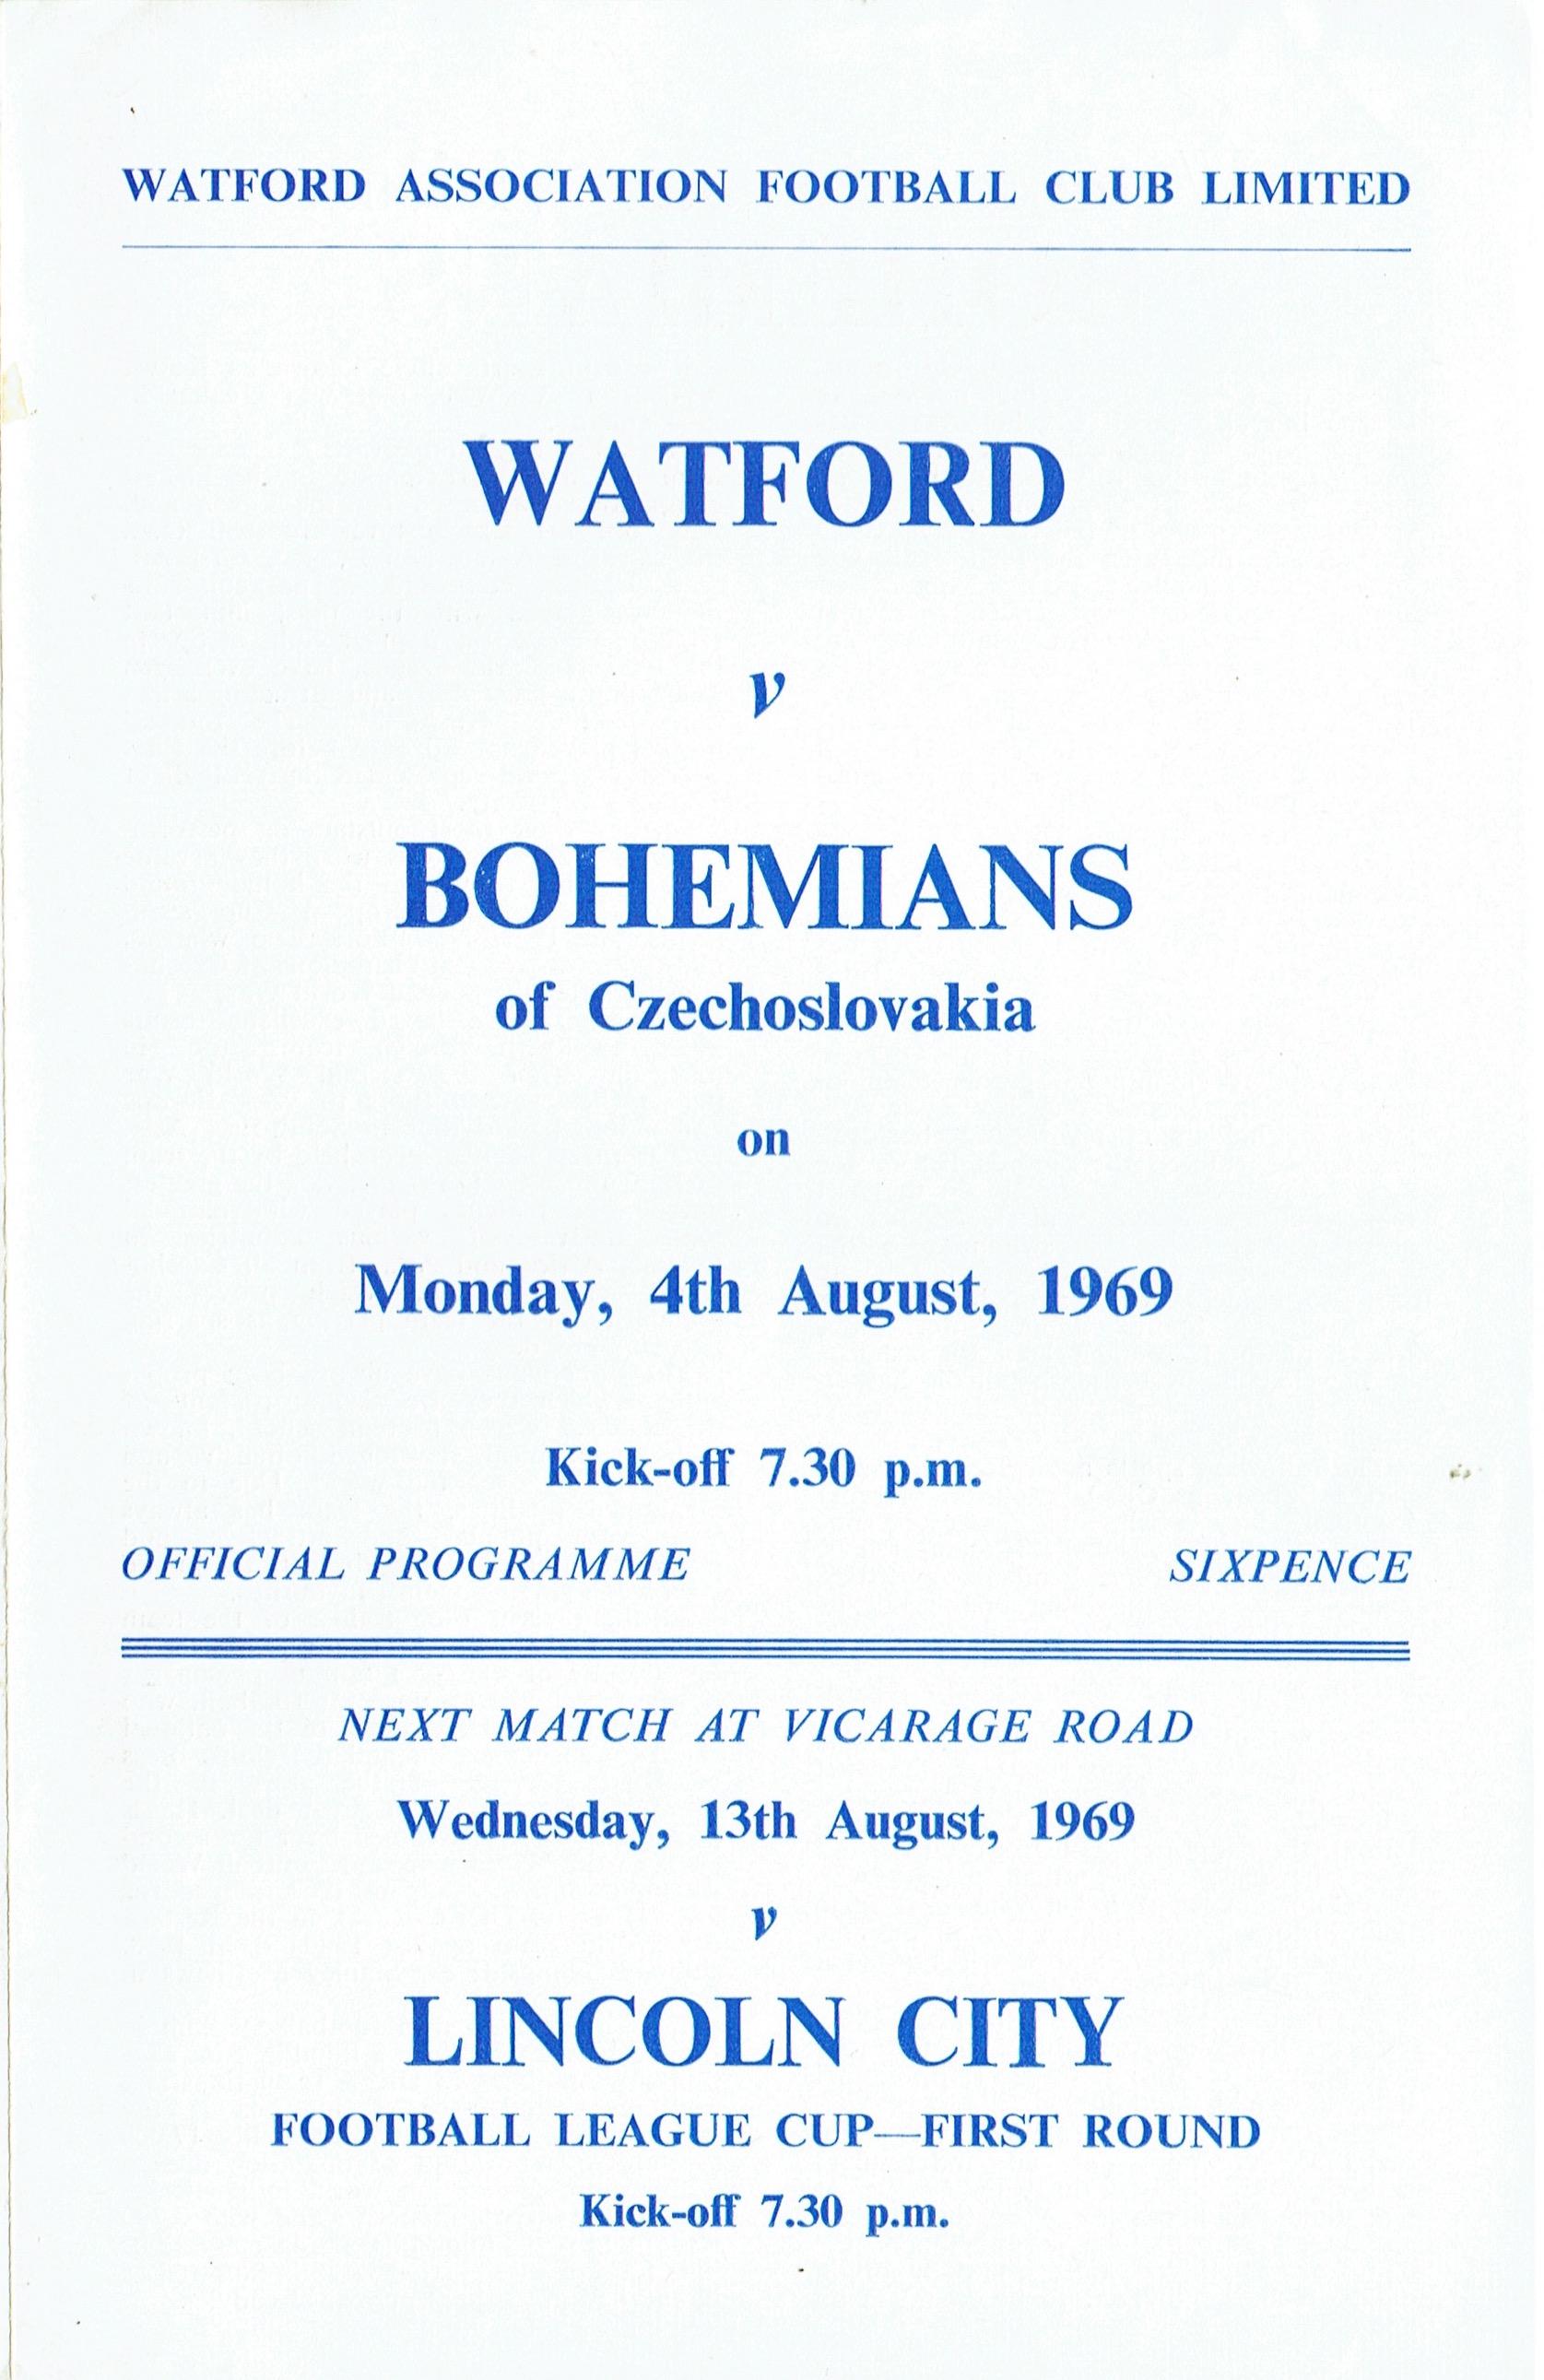 4th August 1969-Friendly, Watford 5 Bohemians Prague (Czechoslovakia